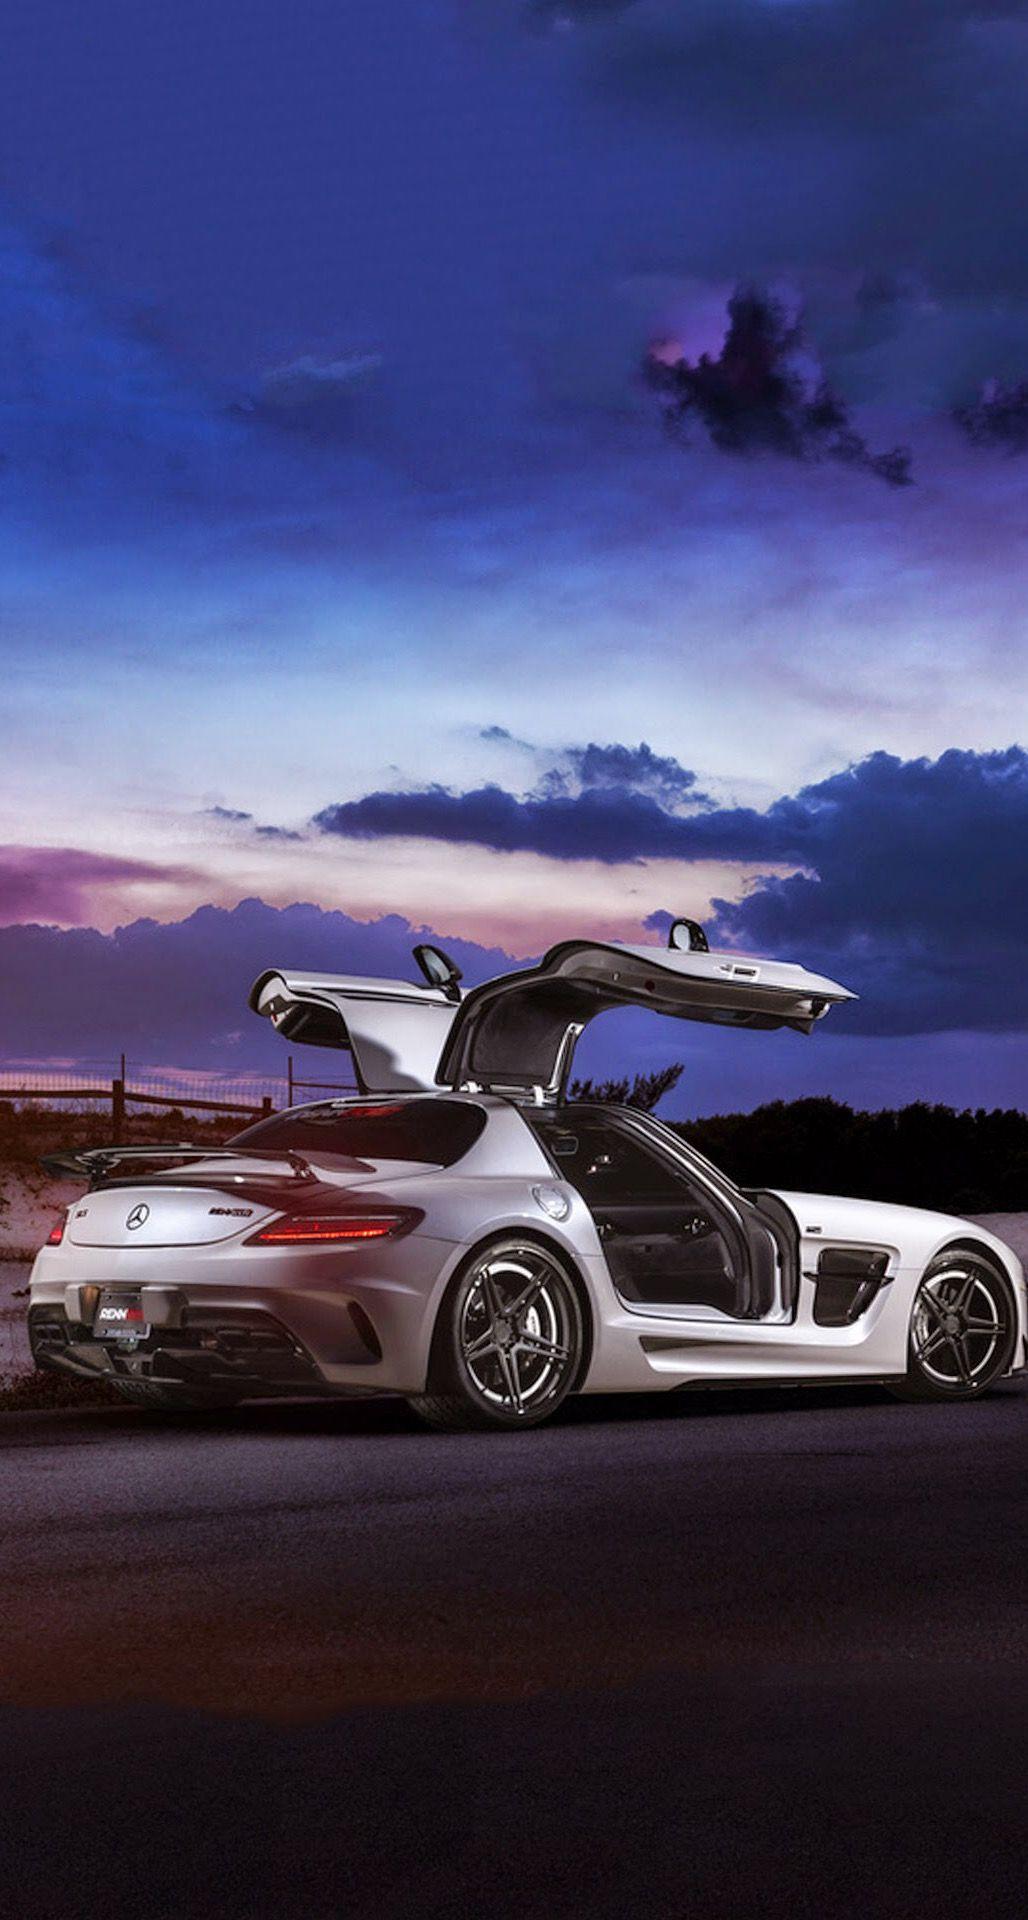 Mercedes Sls Amg Coupe Black Series Iphone 6 Plus Hd Wallpaper